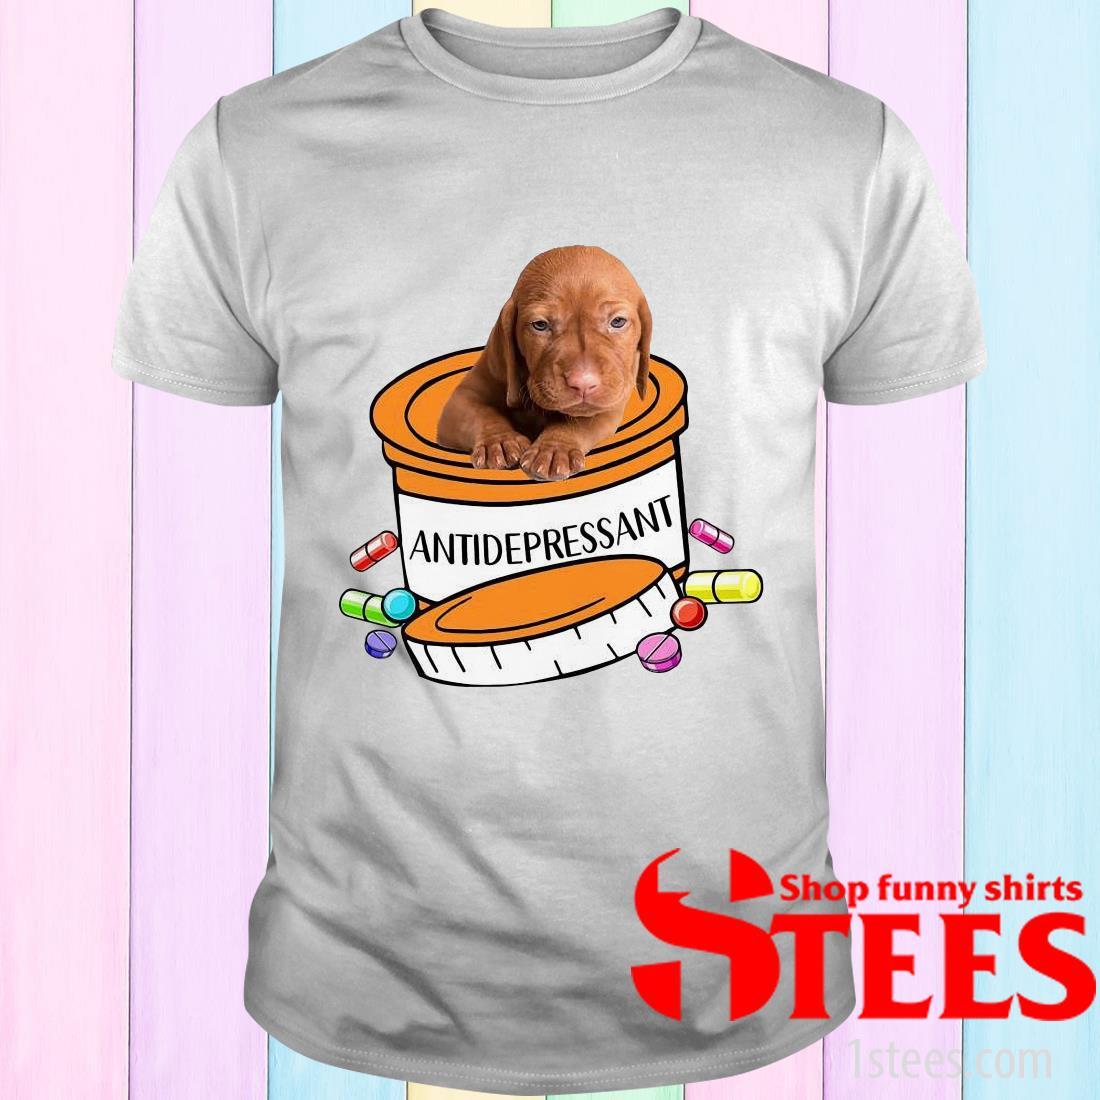 Vizsla Antidepressant T-Shirt